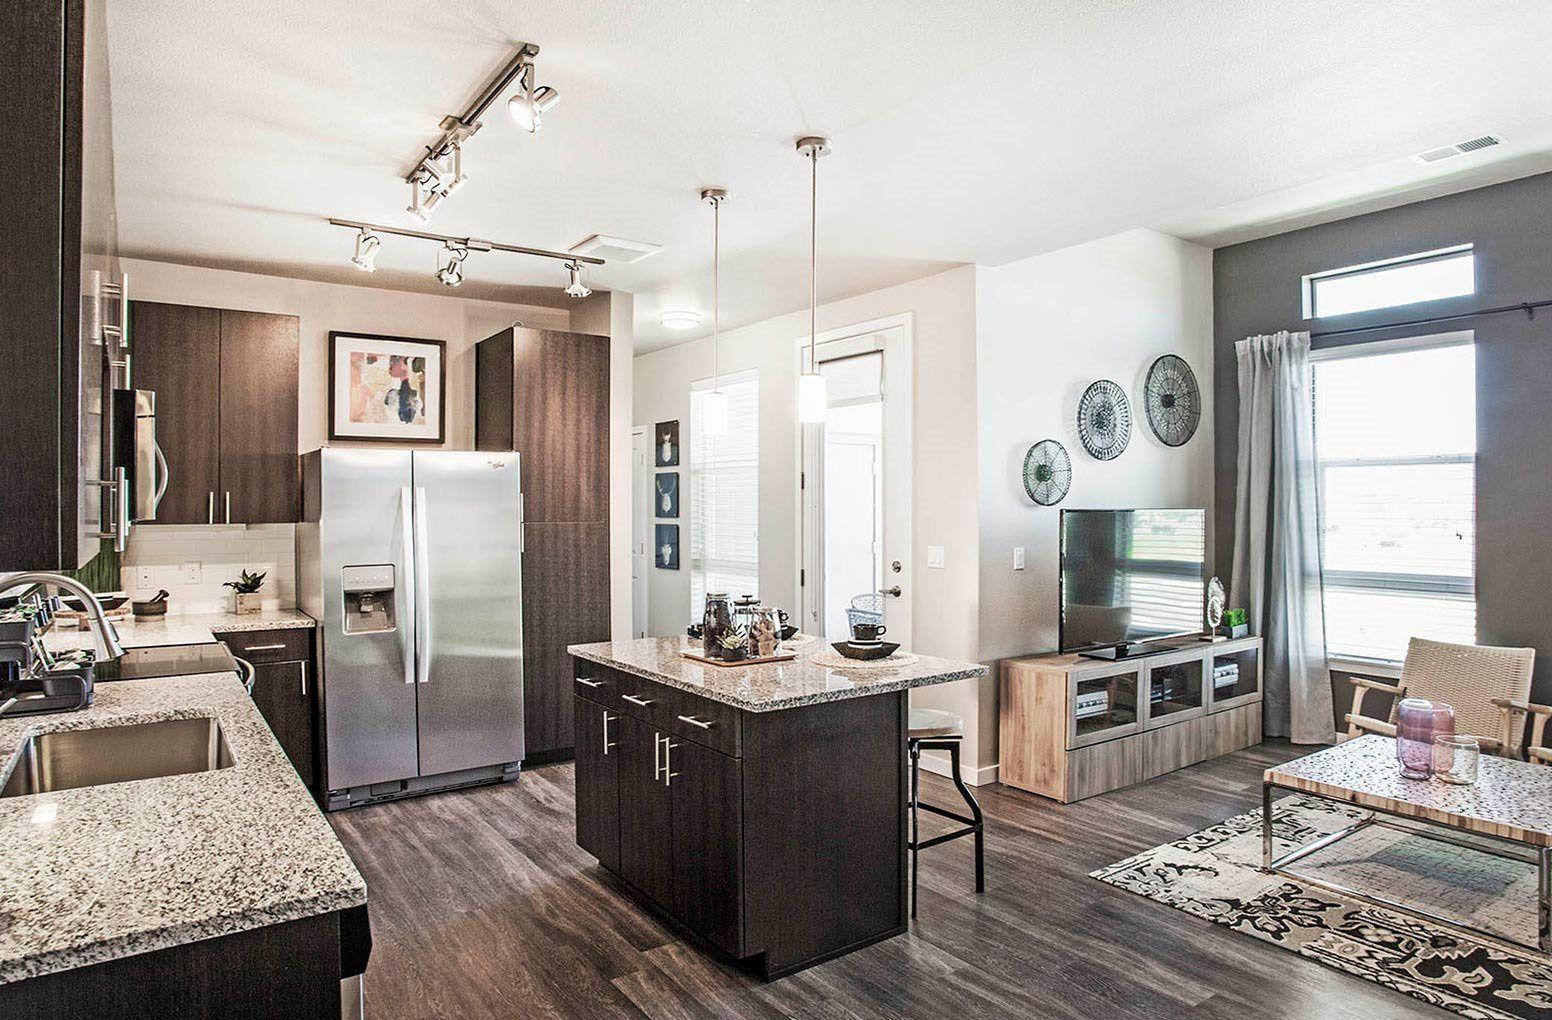 Luxury Apartments Thornton Colorado in 2020 Apartment